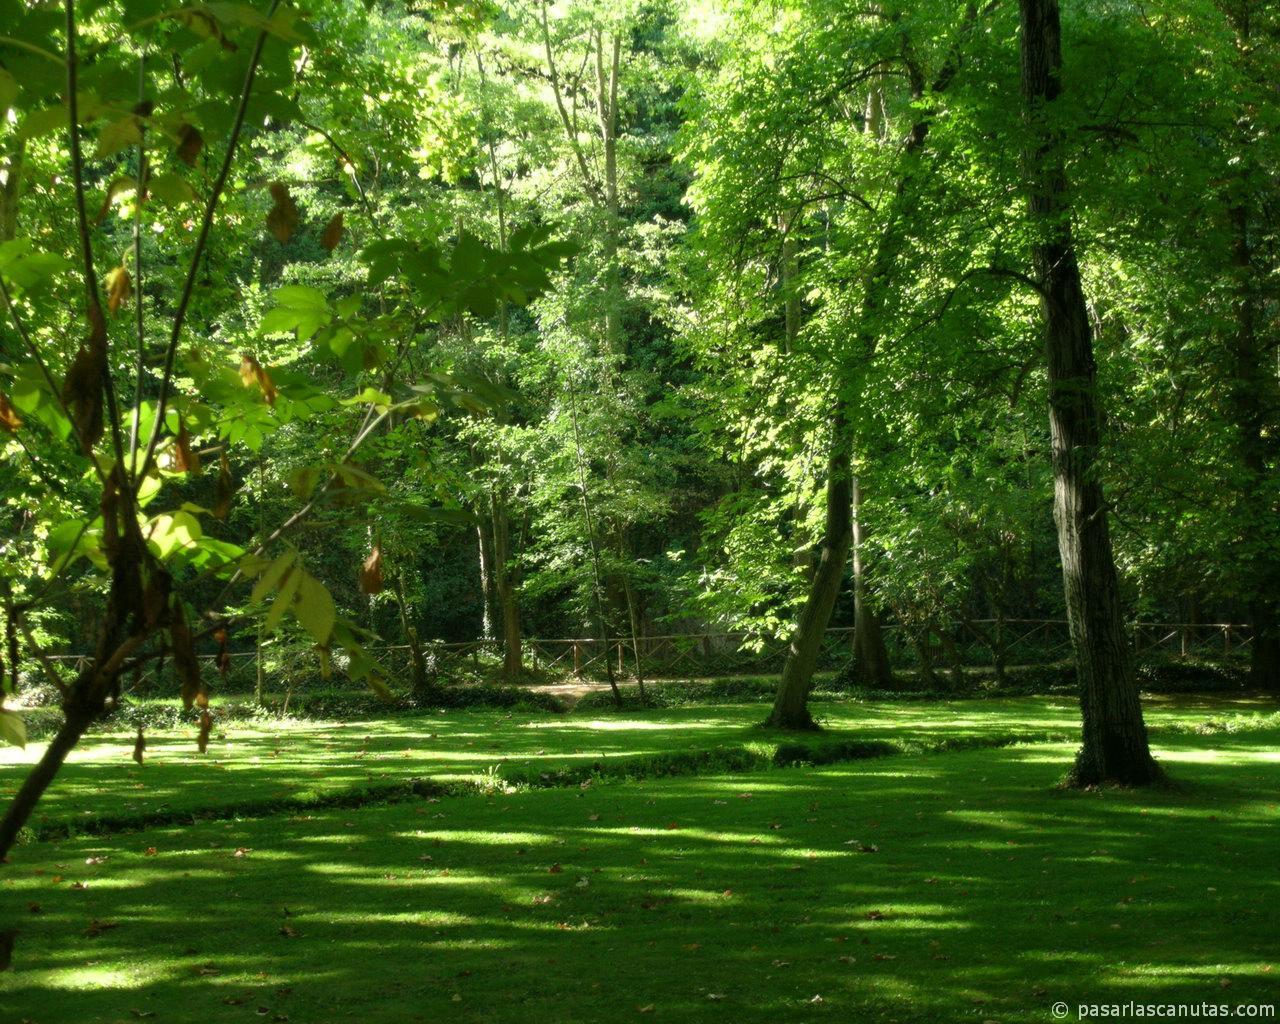 Monasterio de piedra fotos de paisajes for Paisajes de jardines